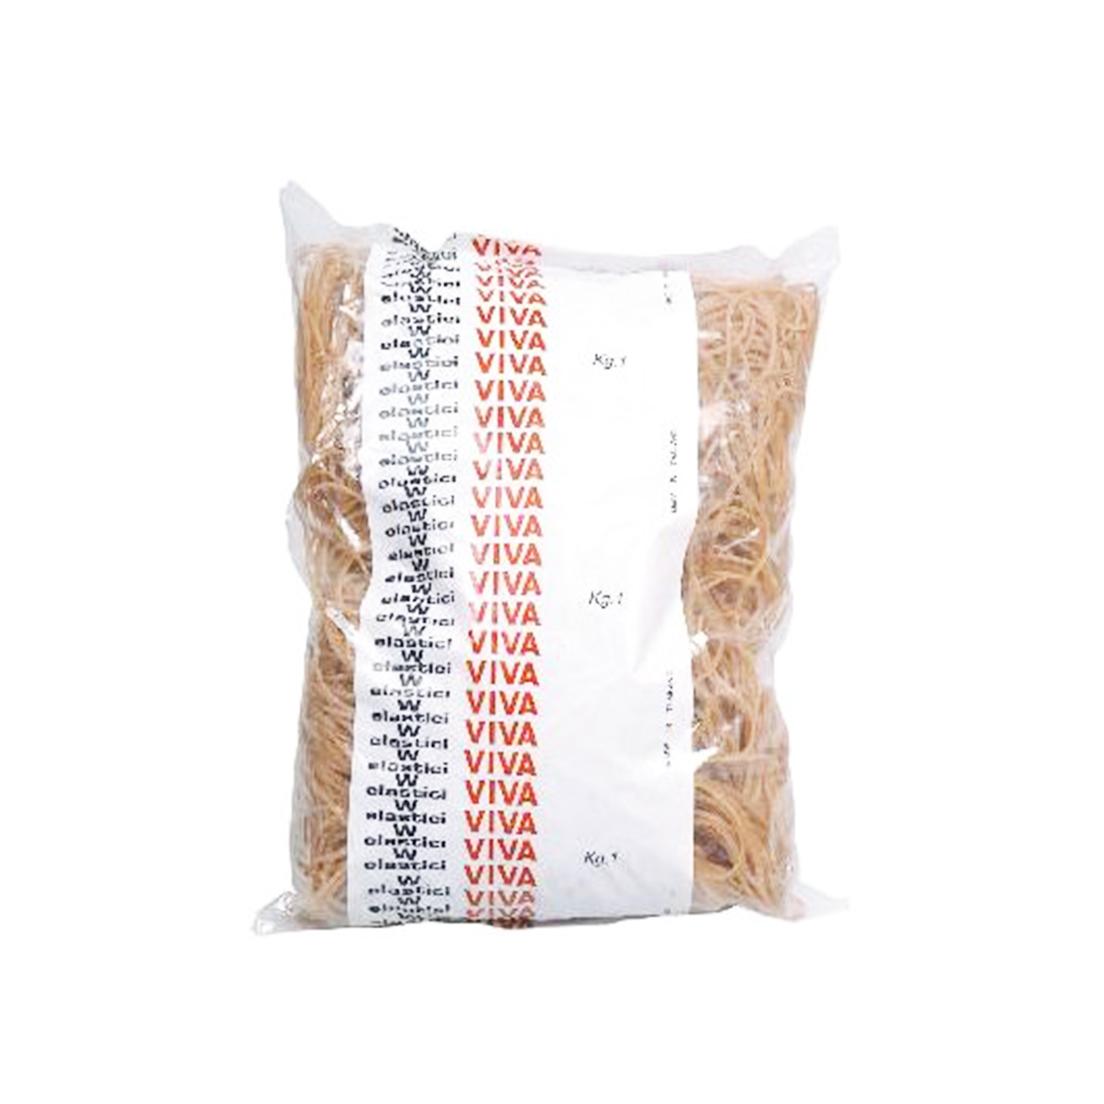 ELASTICI PARA IN BUSTA 50mm 1kg